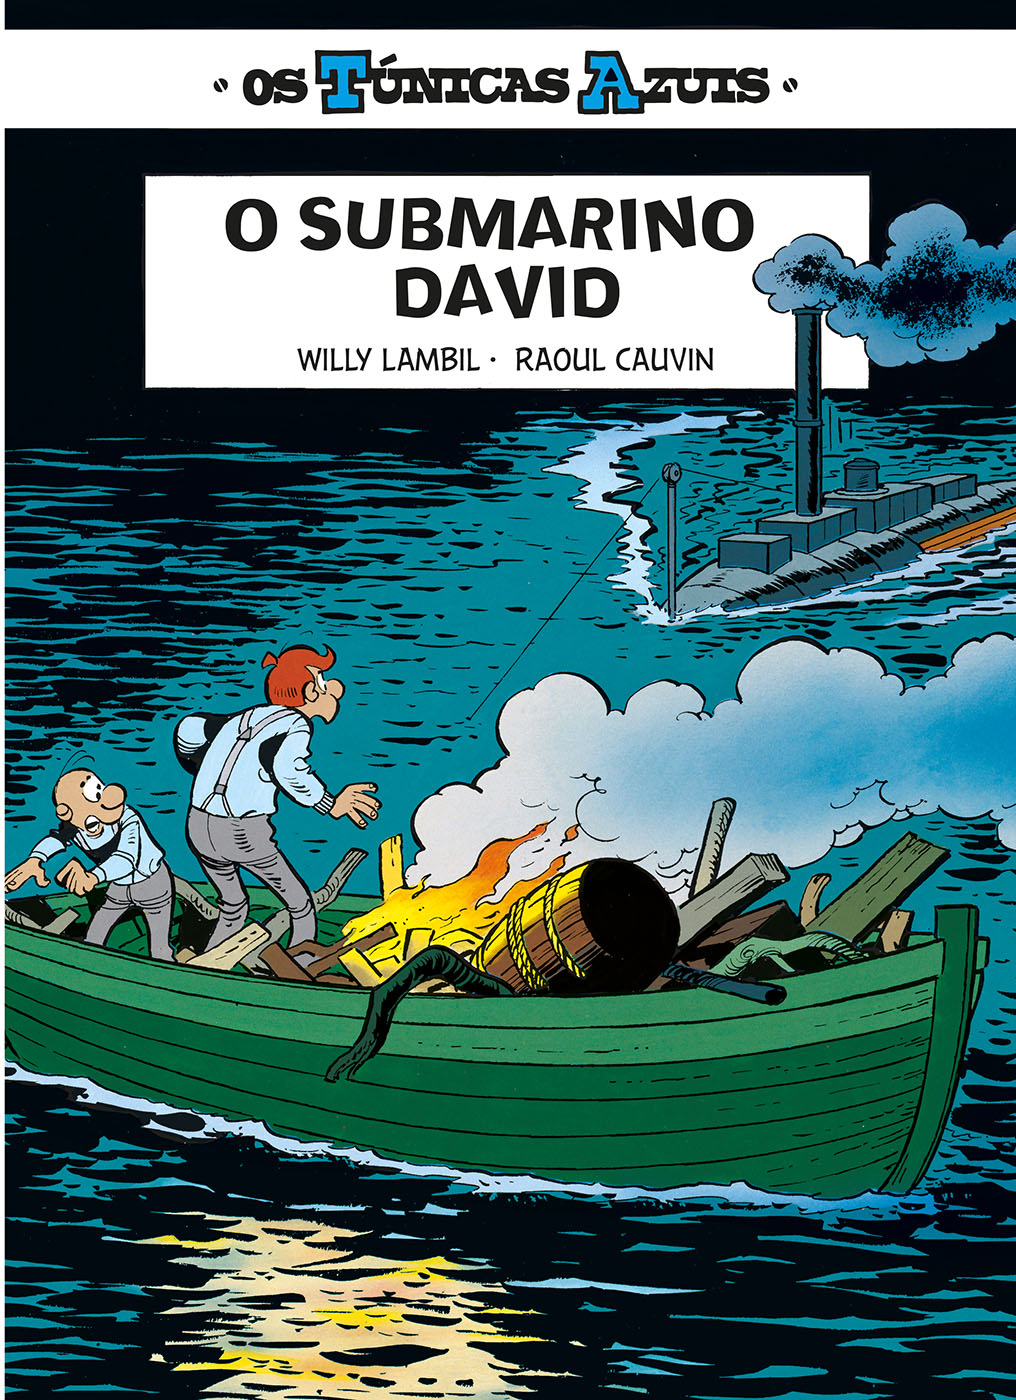 Os Túnicas Azuis 8. O Submarino David